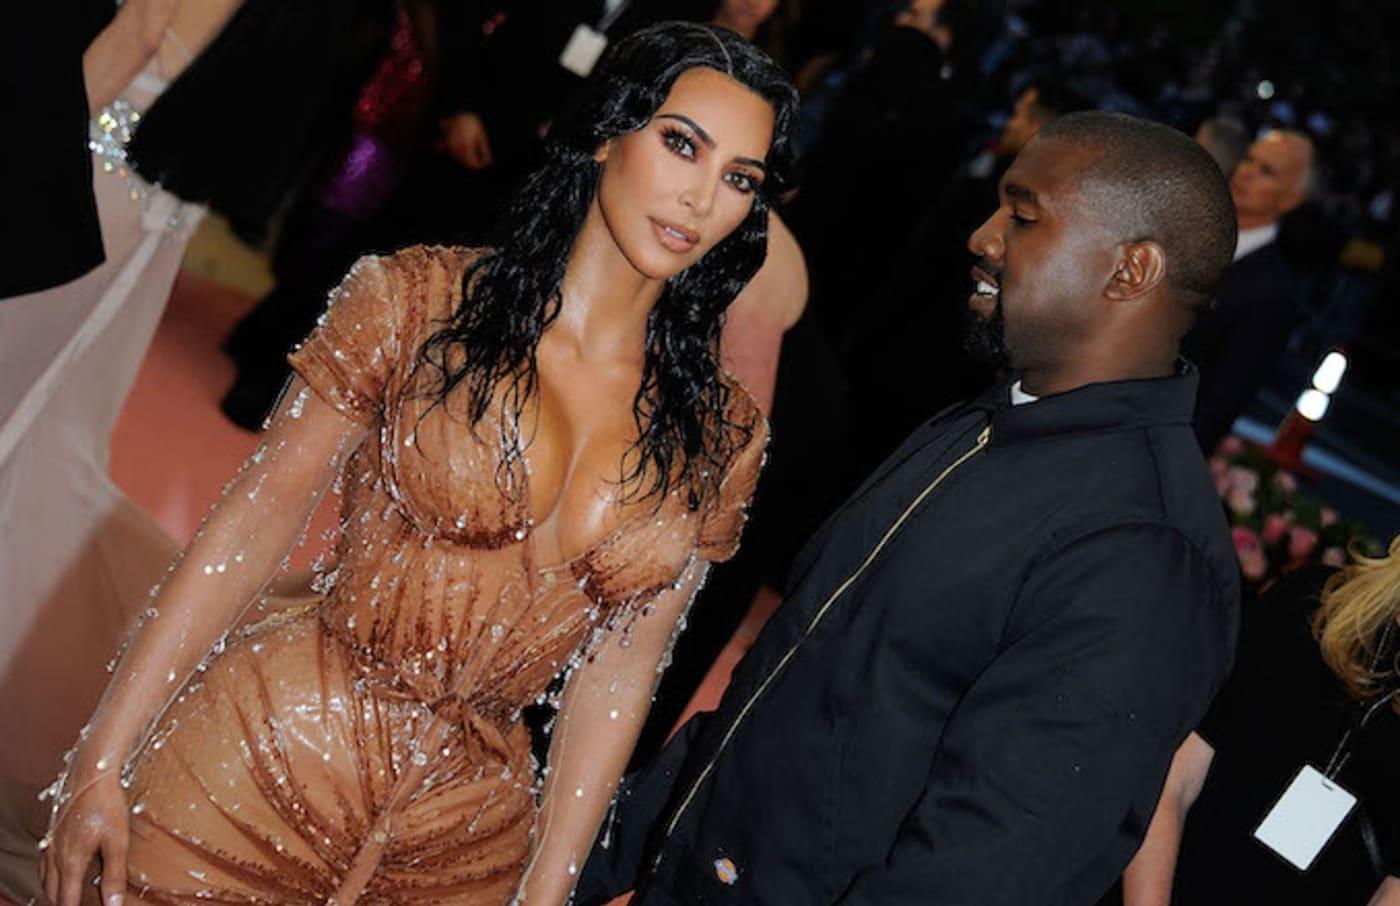 Kim Kardashian West and Kanye West attend The 2019 Met Gala Celebrating Camp.